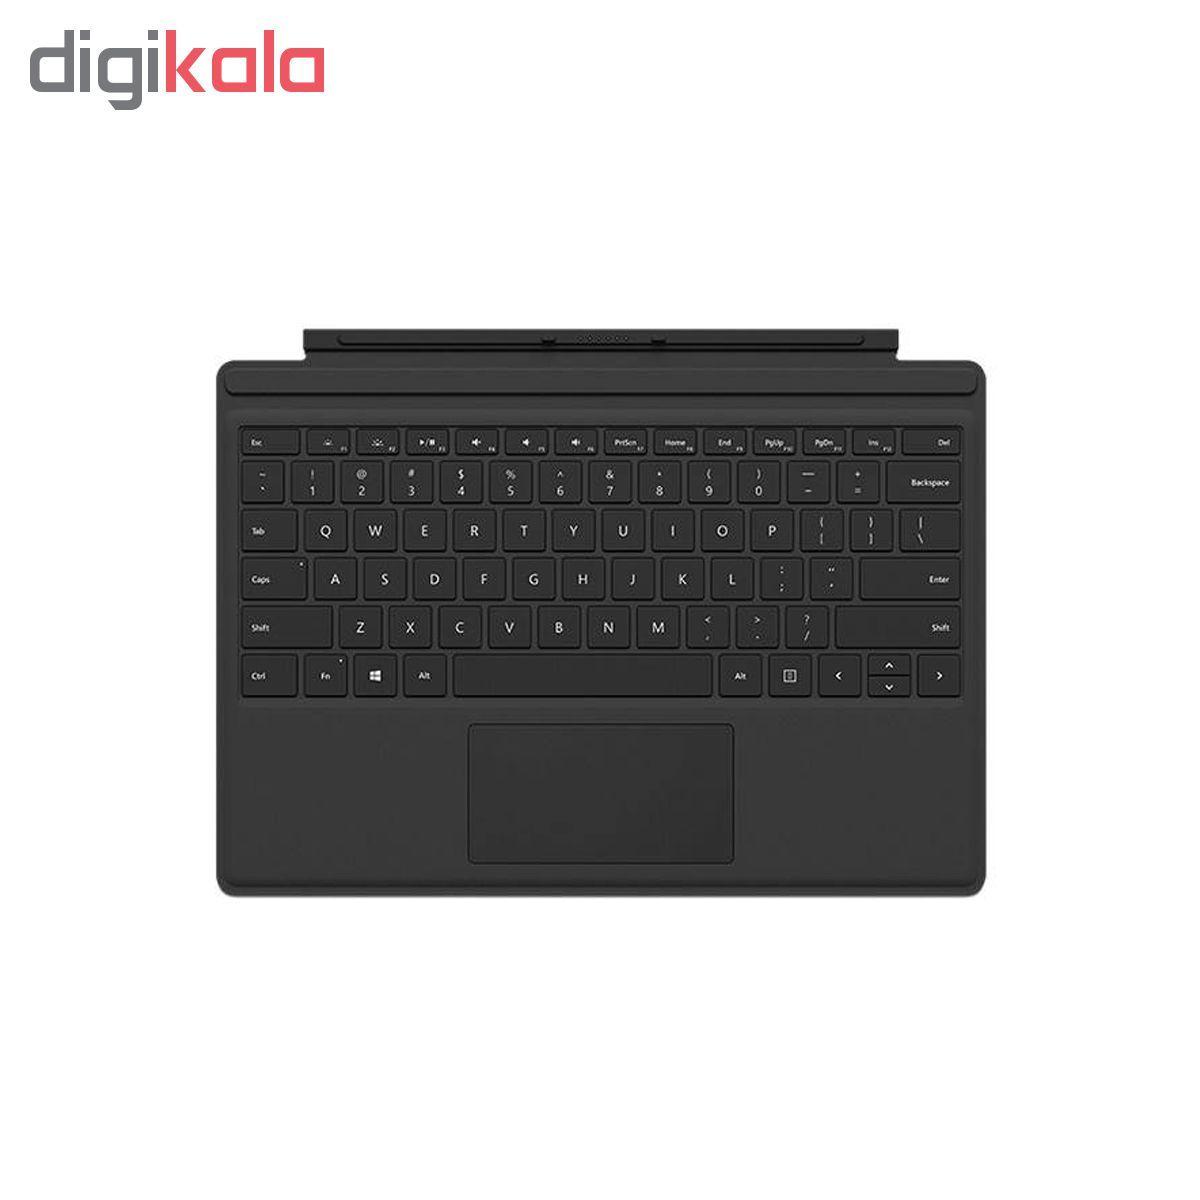 تبلت مایکروسافت مدل Surface Pro 6 - LQ6 به همراه کیبورد TYPE COVER و قلم main 1 7